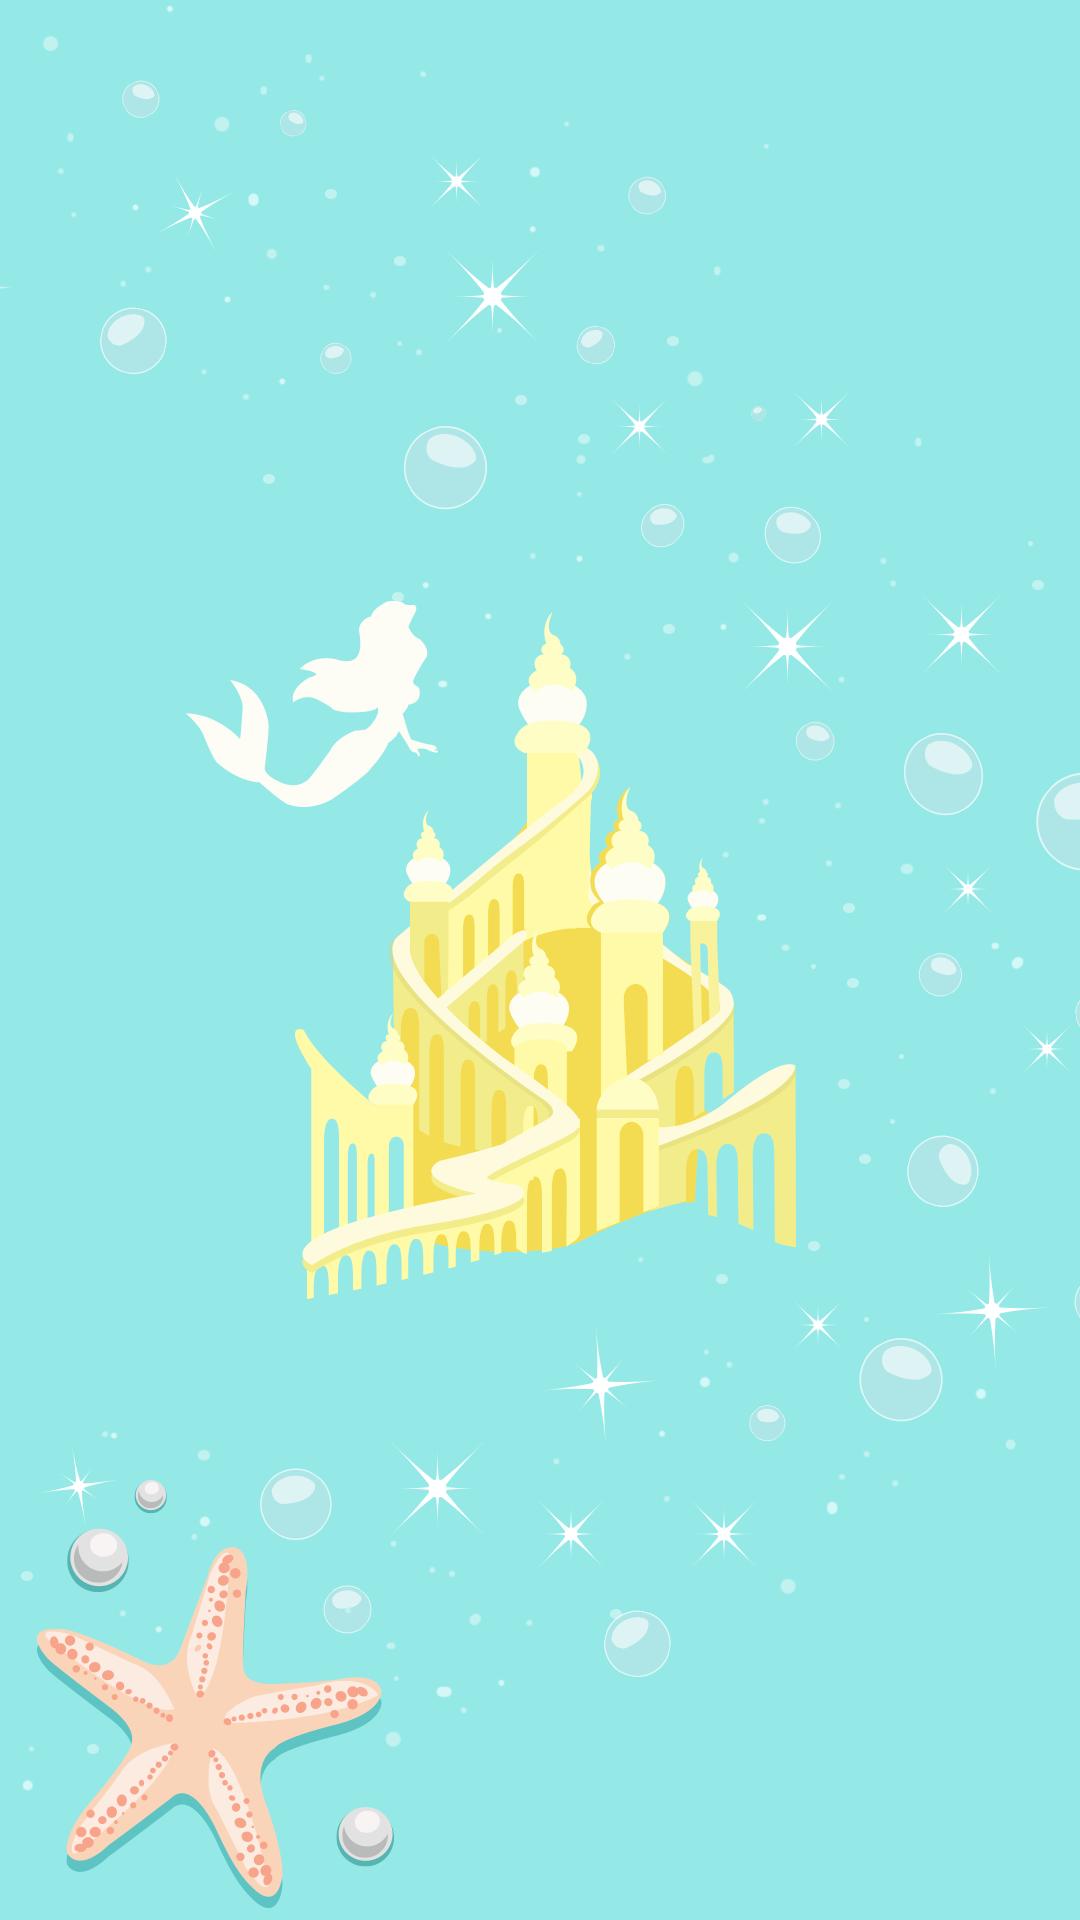 Wallpaper iphone rapunzel - Iphone La Petite Sirene Little Mermaid Ariel Wallpaper Crecre Fond D Cran